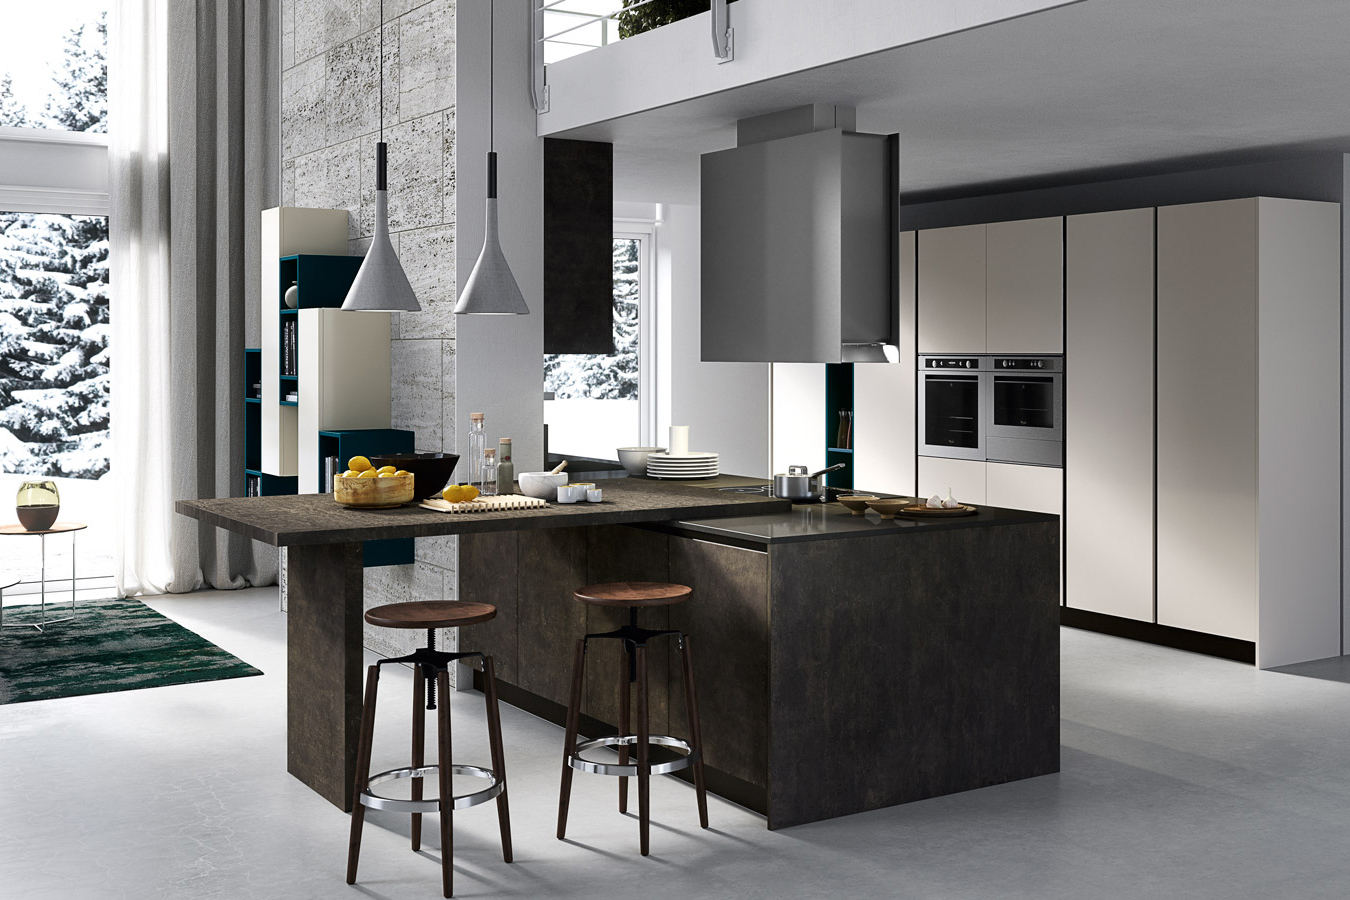 Mobili cucine moderne cheap cucine moderne with mobili for Mobili cucine moderne componibili